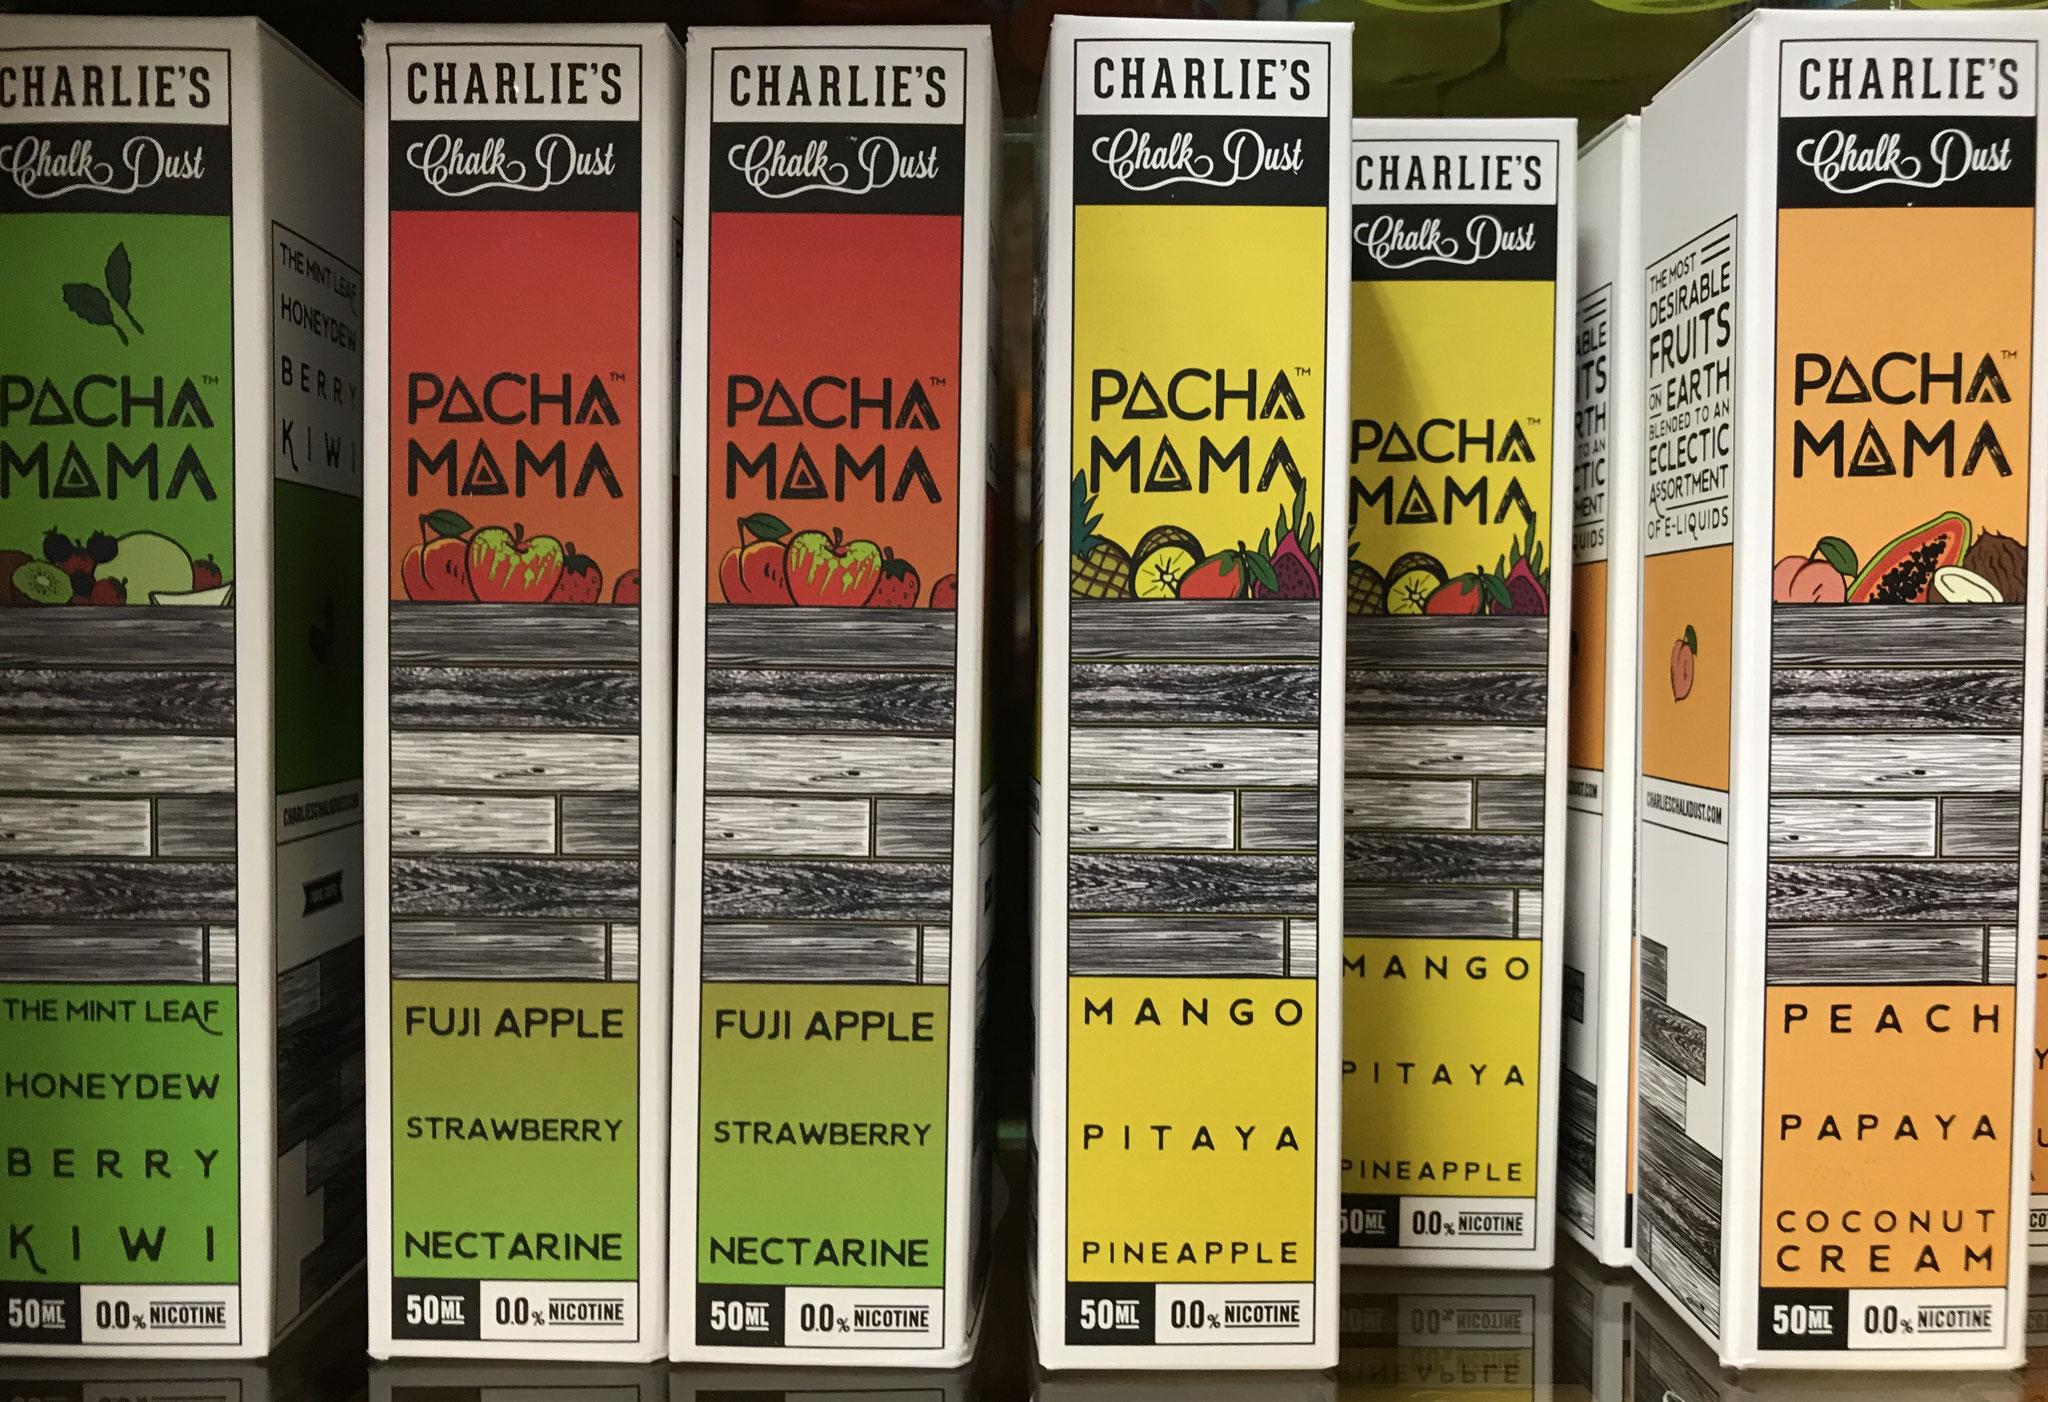 Charlie's Chalk Dust - Pacha Mama E-Liquids